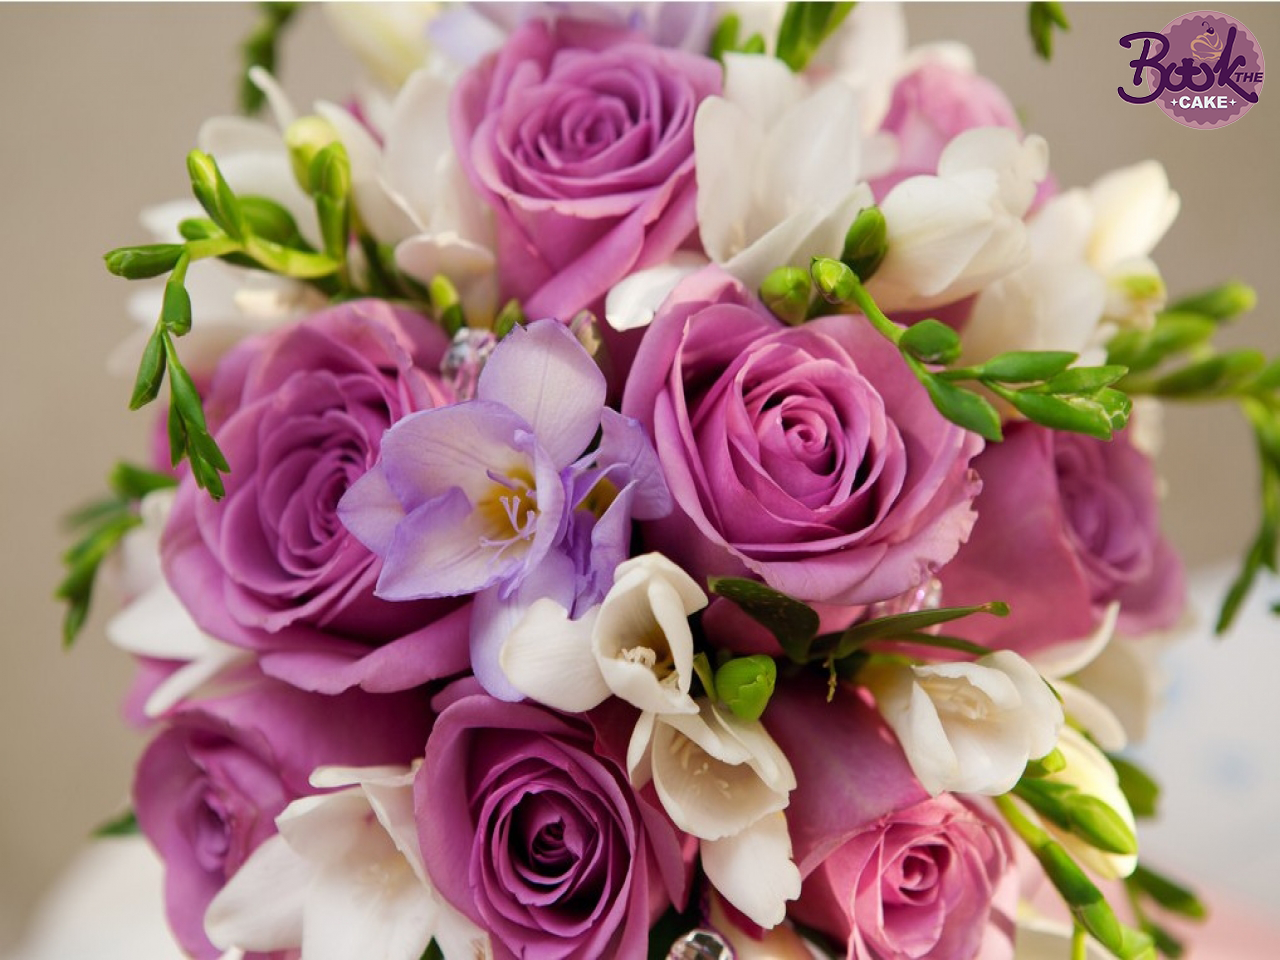 Goonxud6h Flower Design Wedding Online Bookthecake